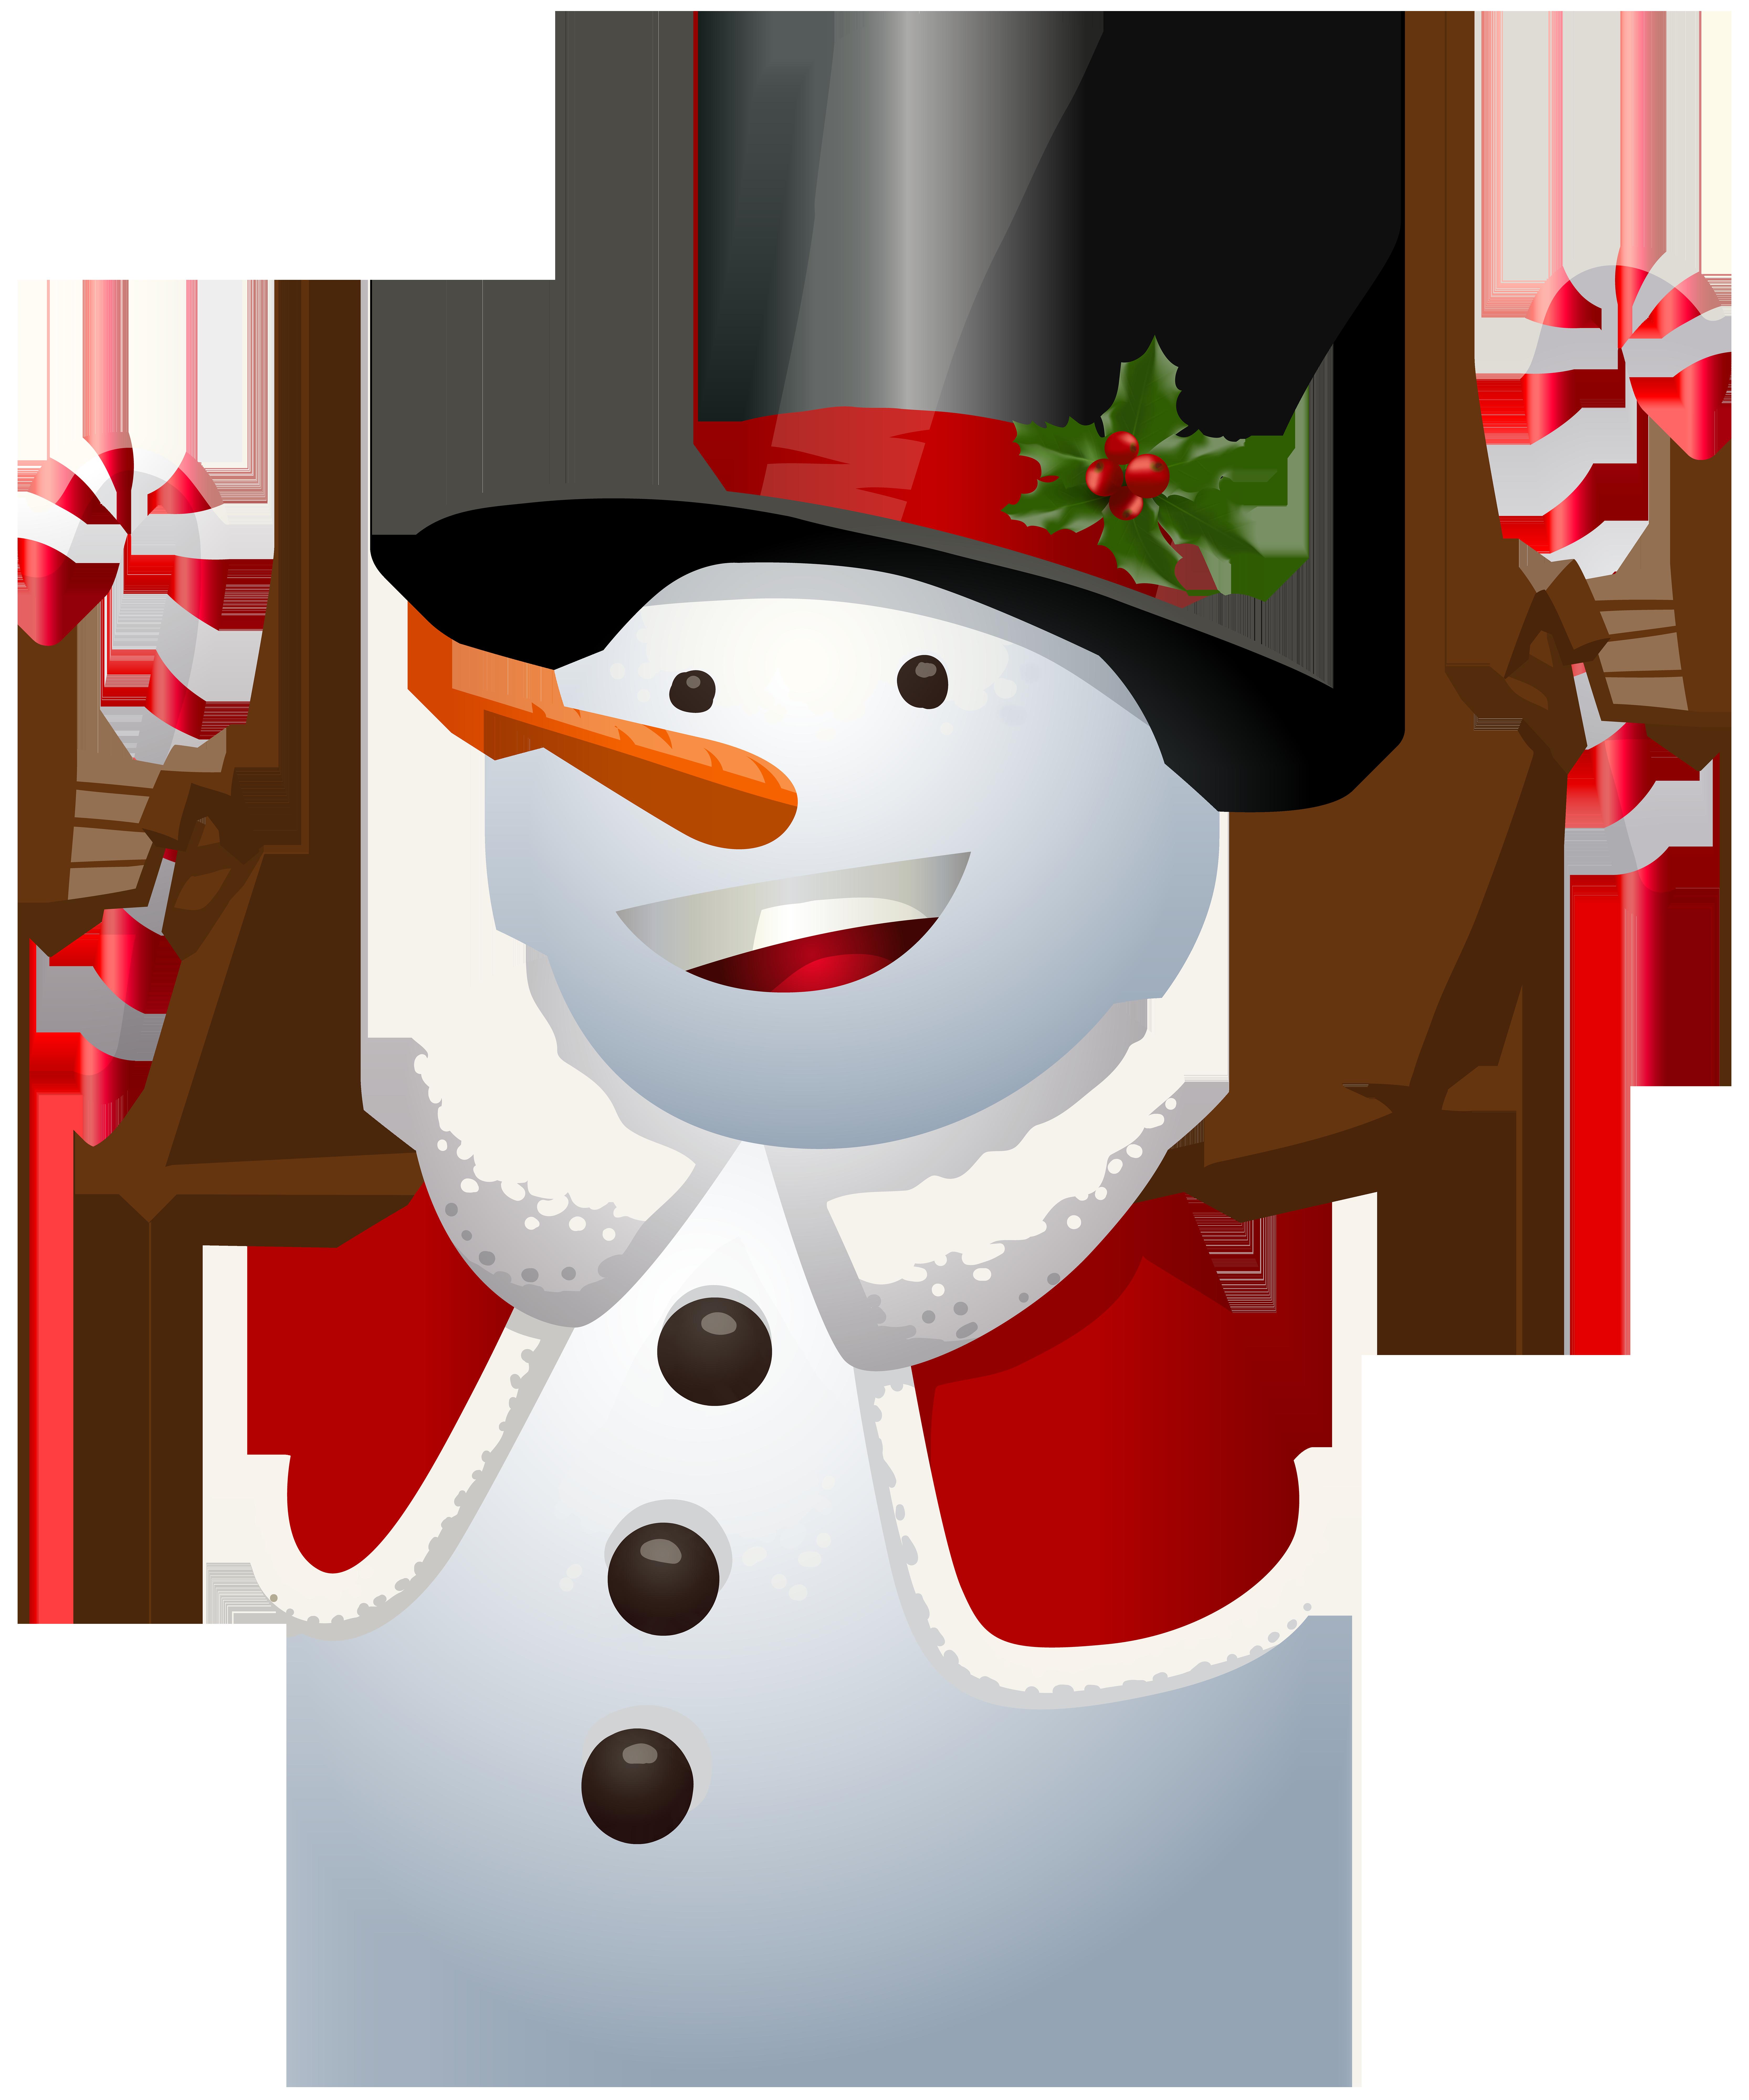 Ipad school clipart clip art free download Snowman PNG Transparent Clip Art Image | Gallery Yopriceville ... clip art free download